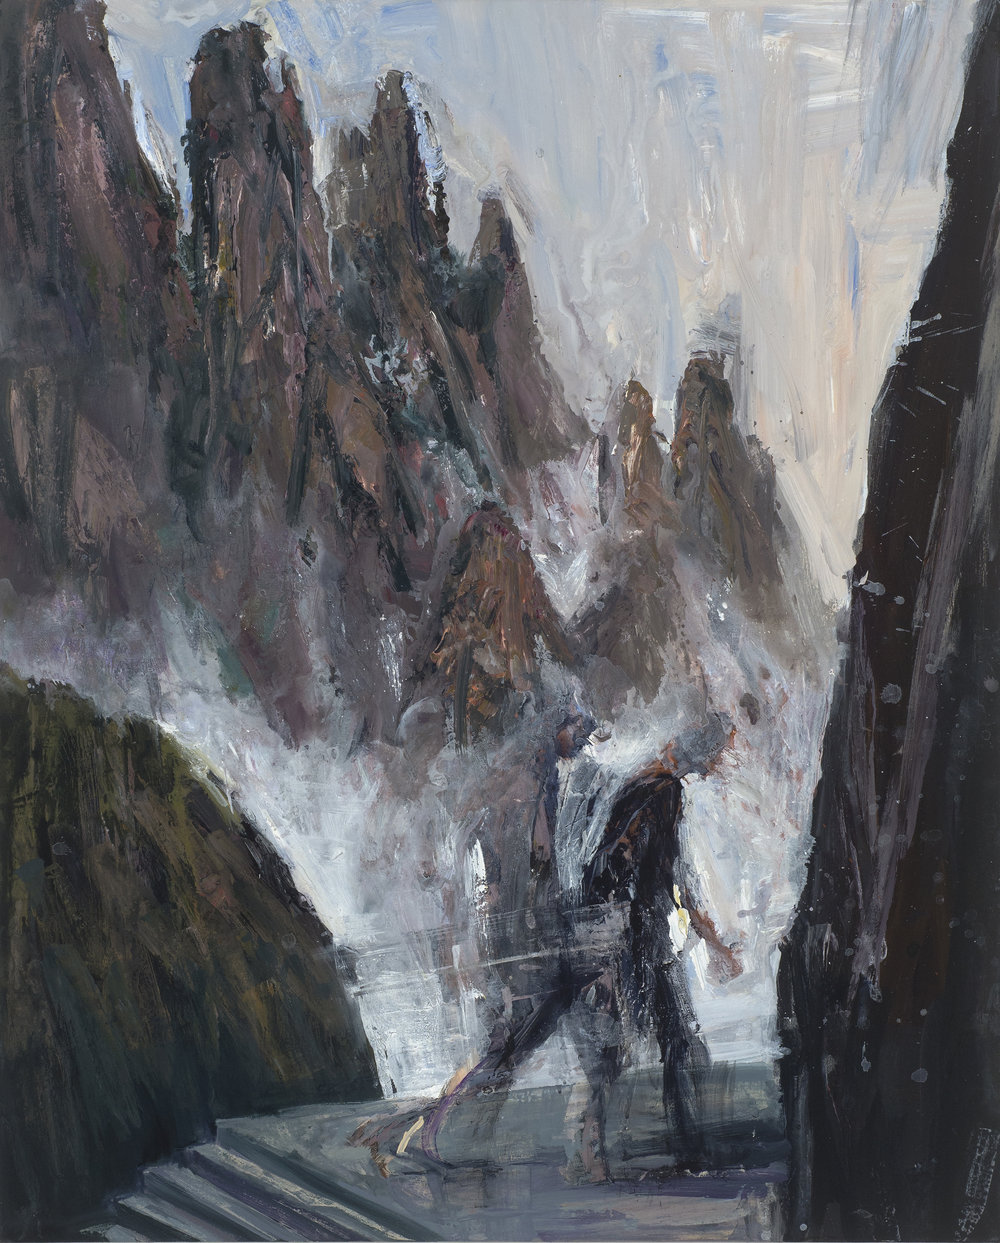 Figures & mountains in mist  霧中的人與山   Euan Macleod , 2016  Acrylic on polyester, 124 x 100 cm, HKD 113,800